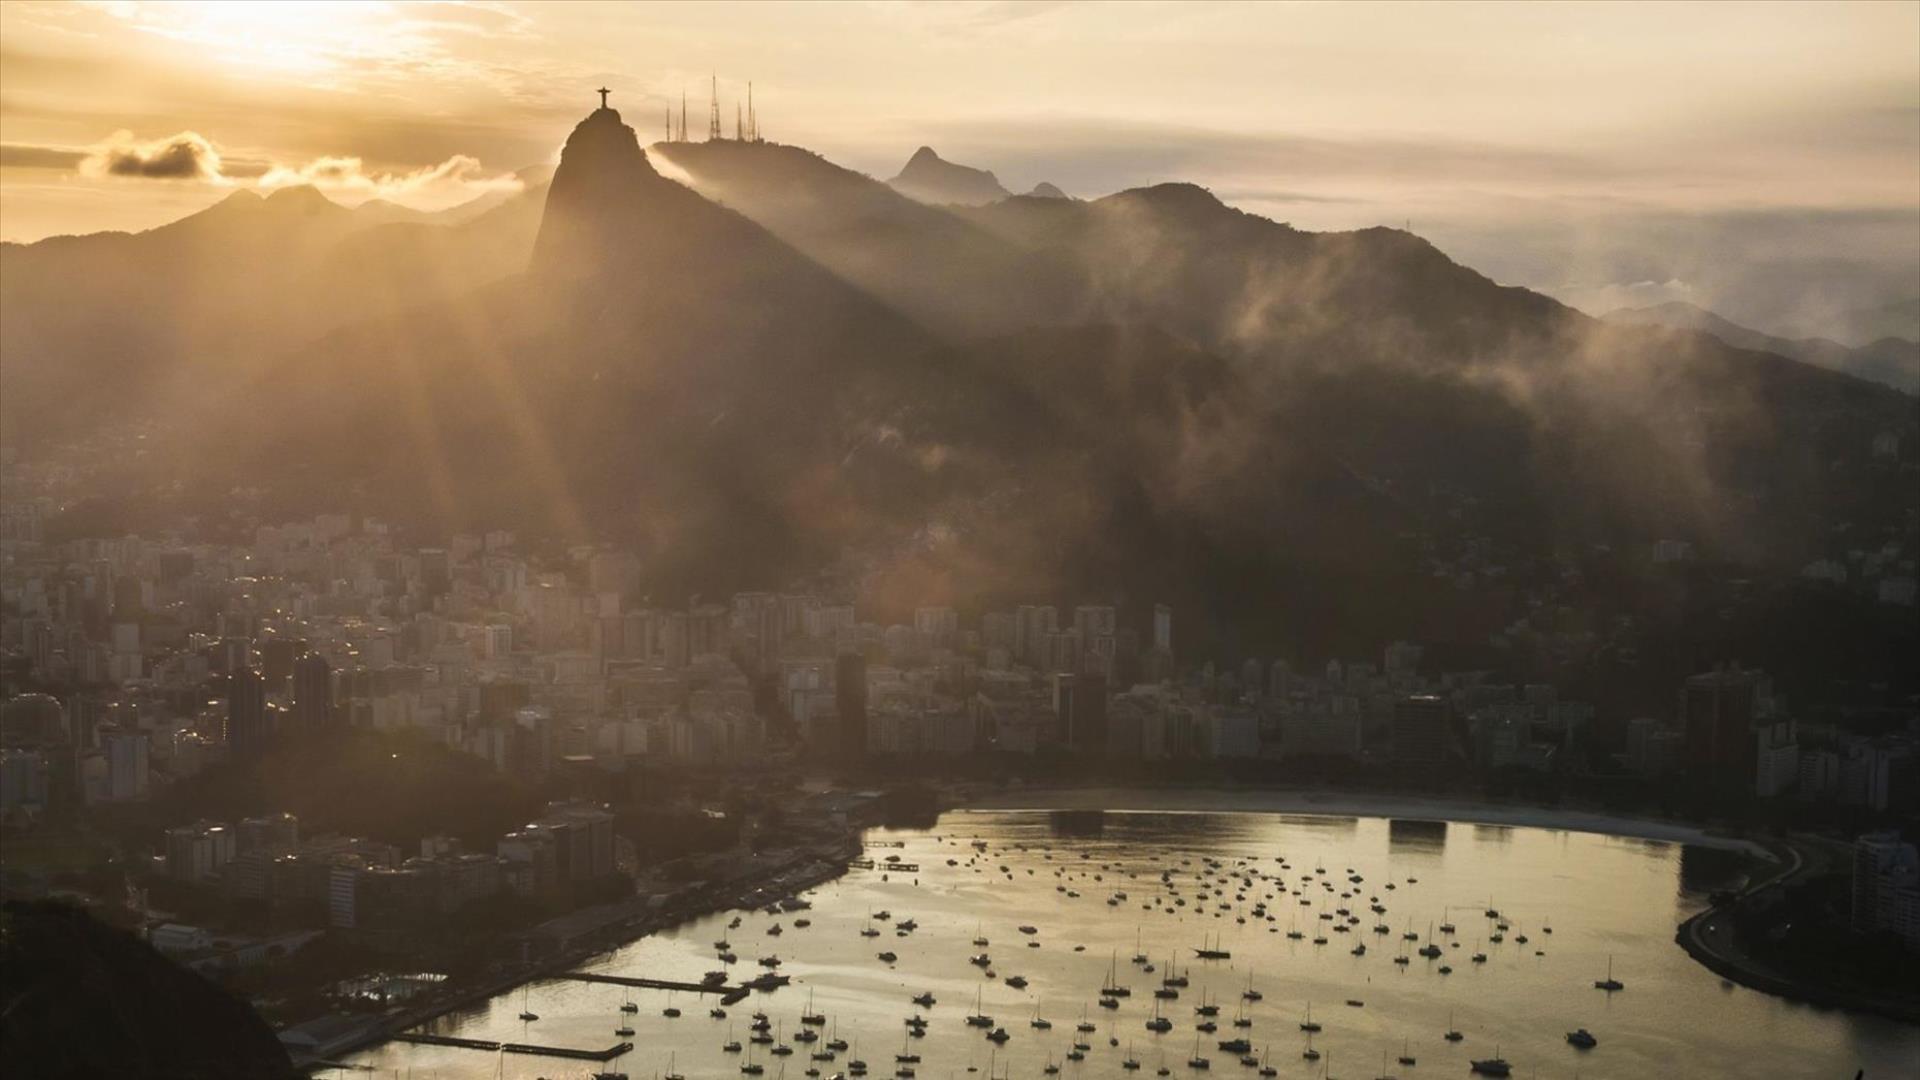 Brasilien / Rio de Janeiro: 6 Tage Reisebaustein - Karneval in Rio de Janeiro erleben